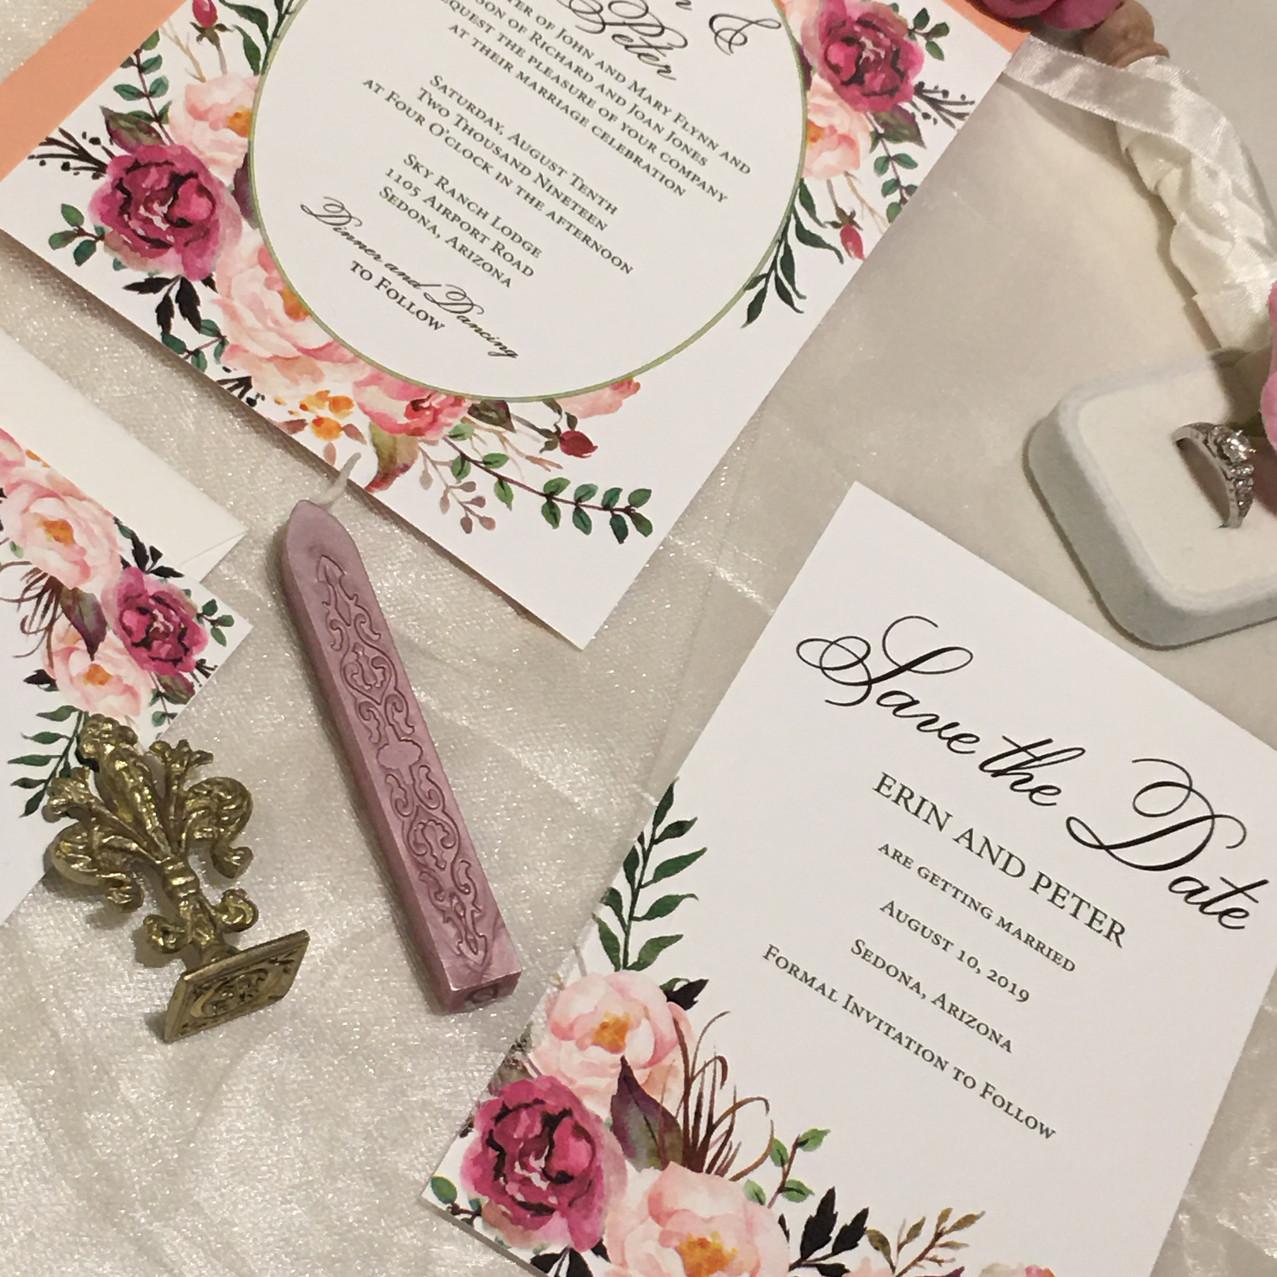 Boho Wedding Invitation Erin - Amira Des